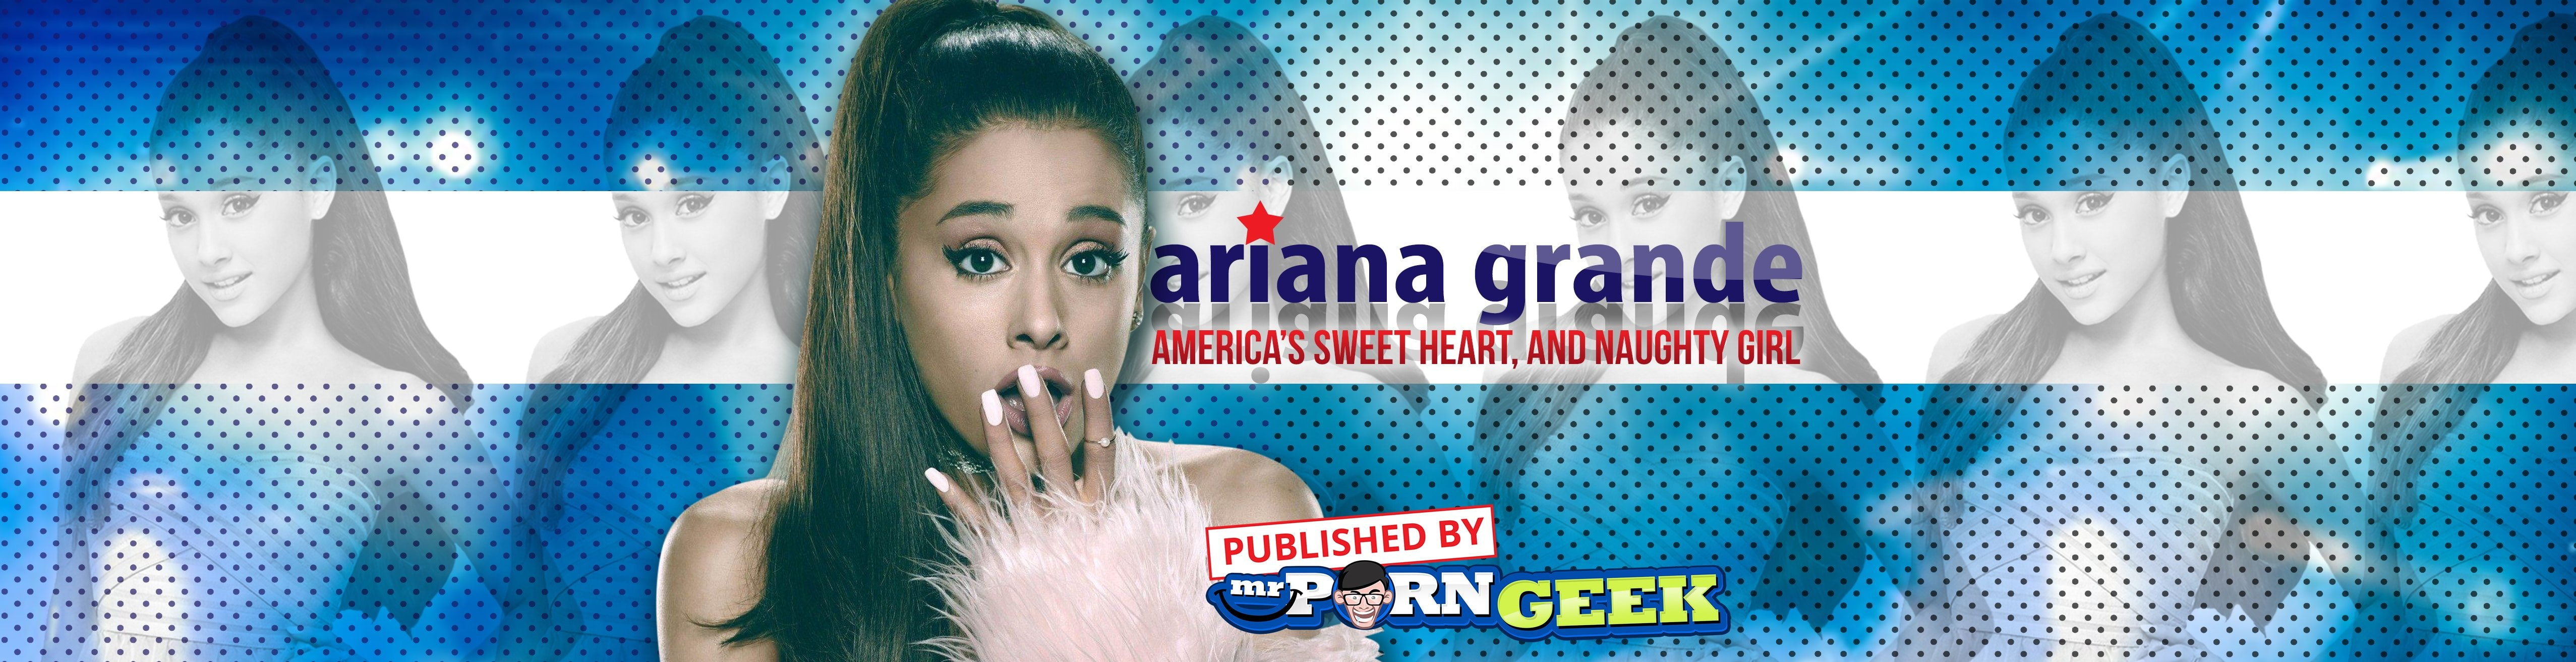 Ariana Grande Sex Tape Porn hot ariana grande - nude america's sweet heart, and naughty girl